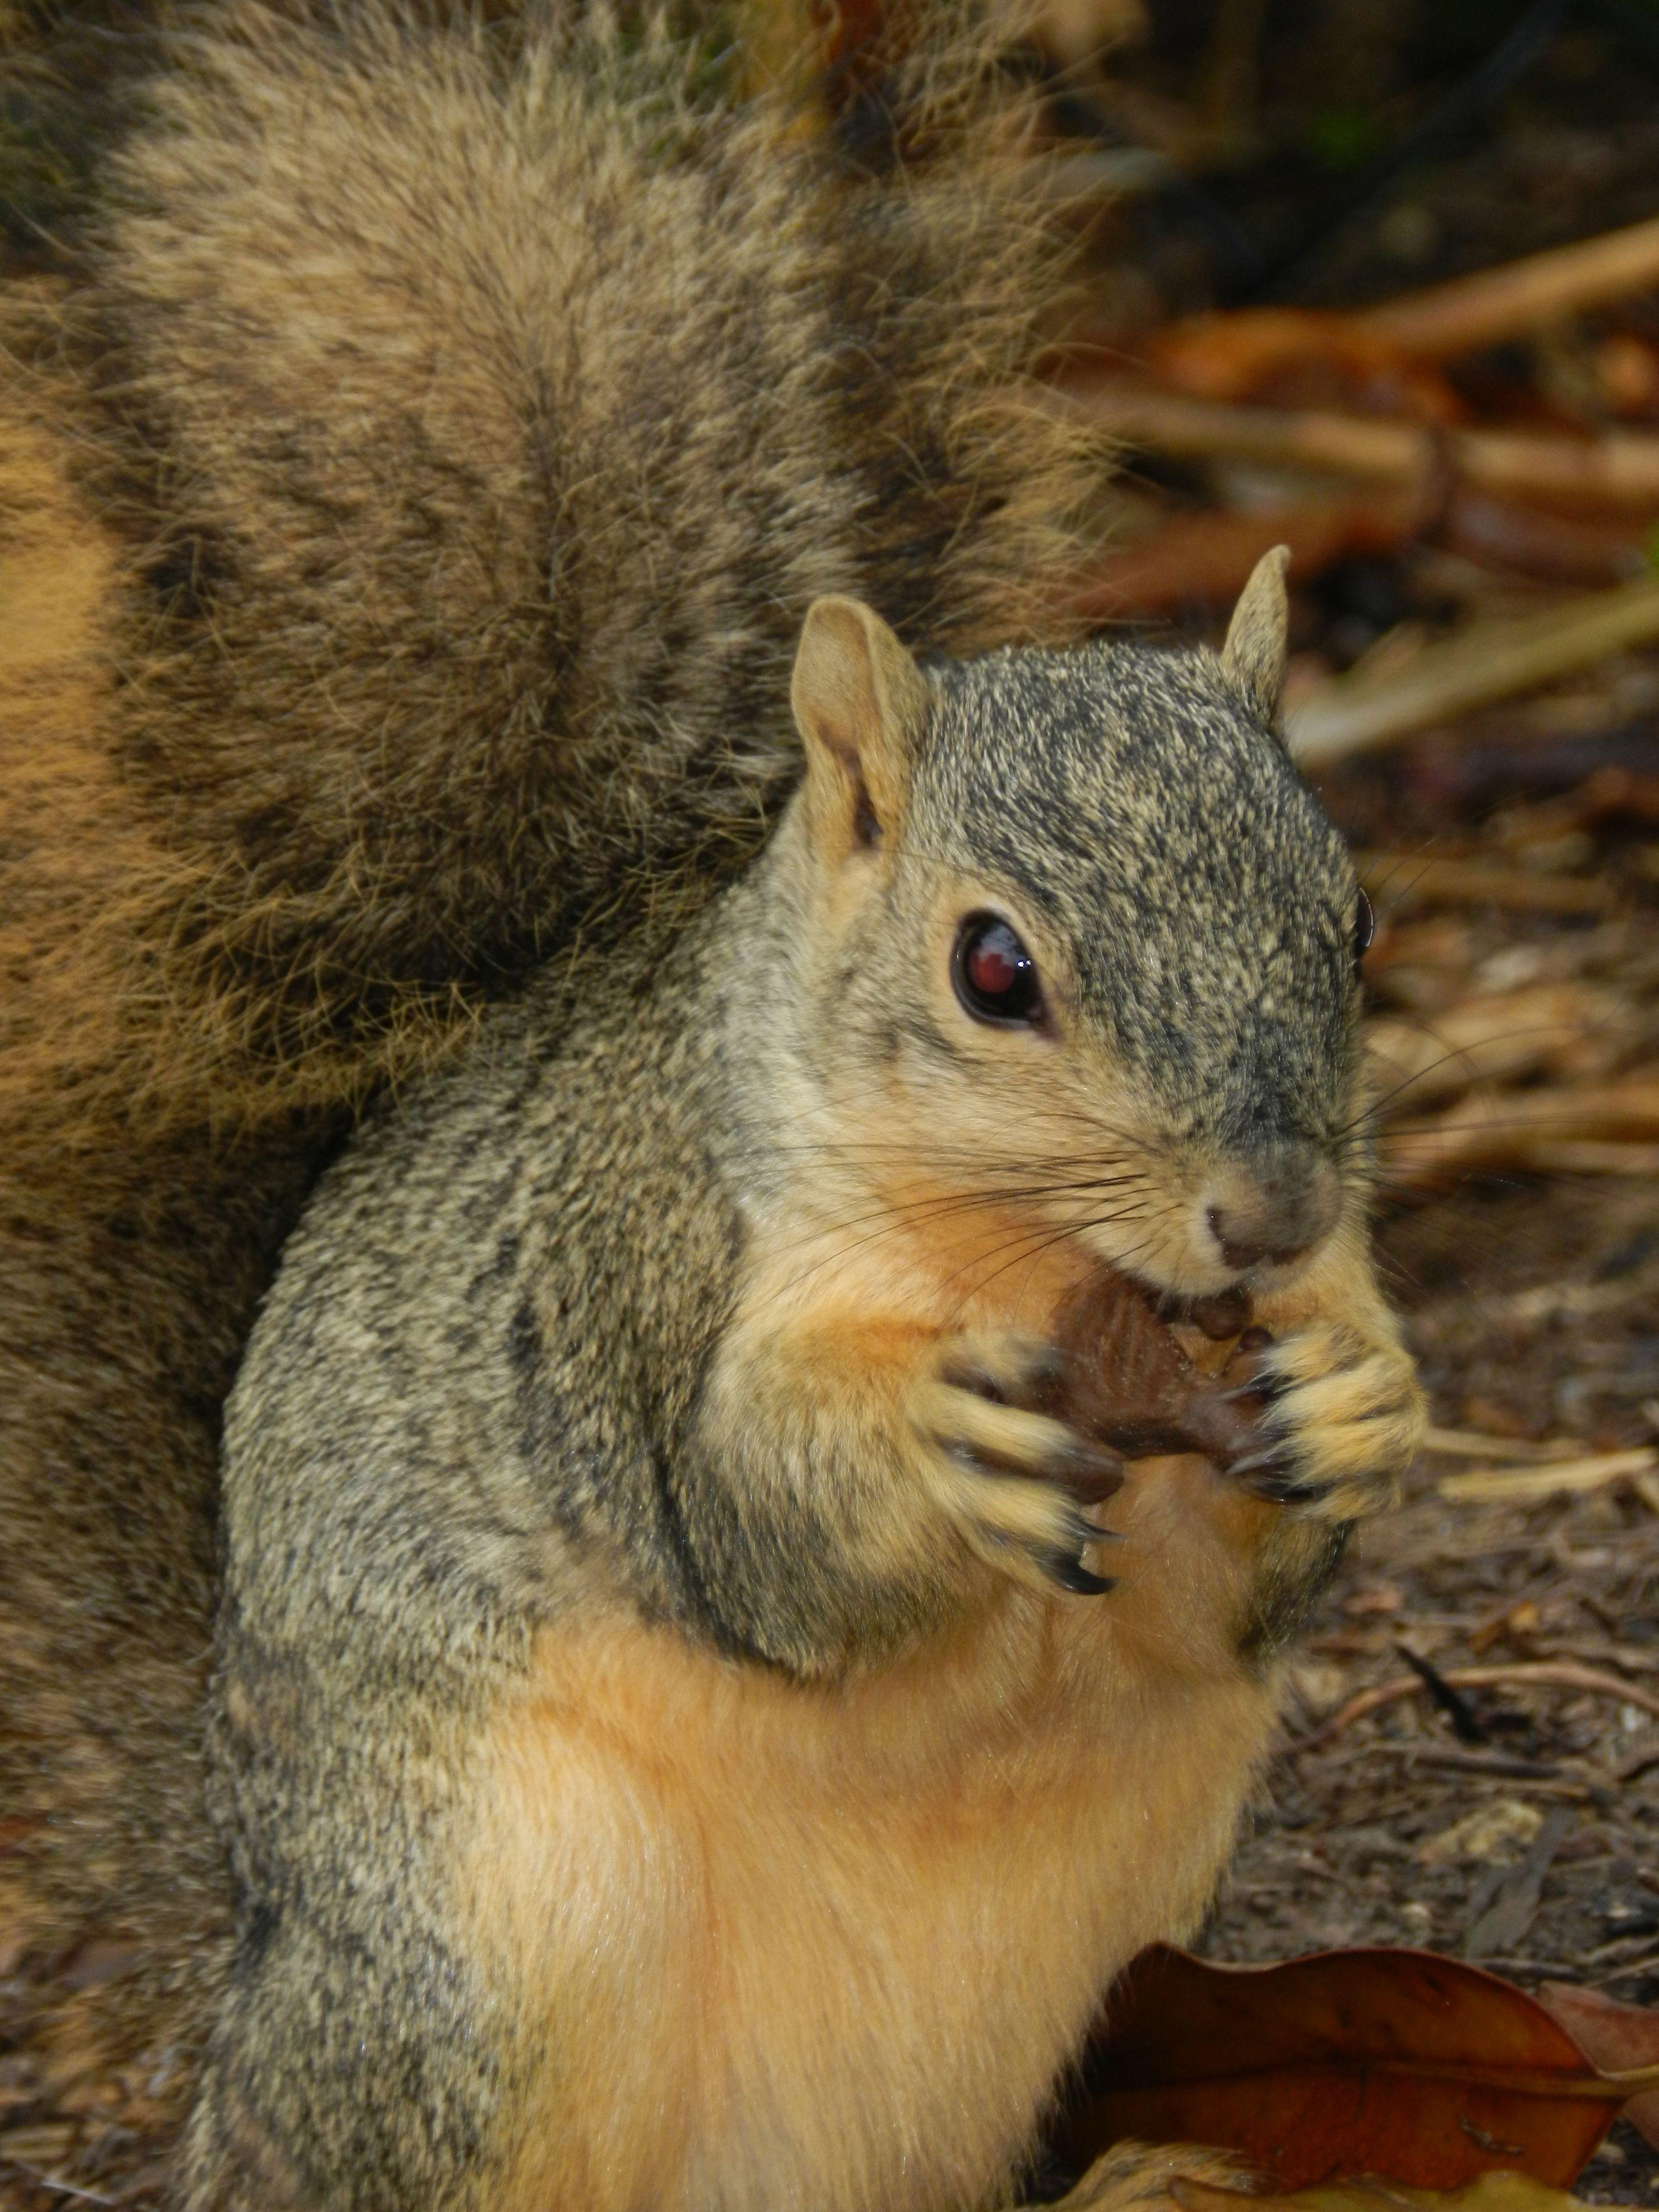 Texas Squirrel Fox squirrel, Squirrel, Animals